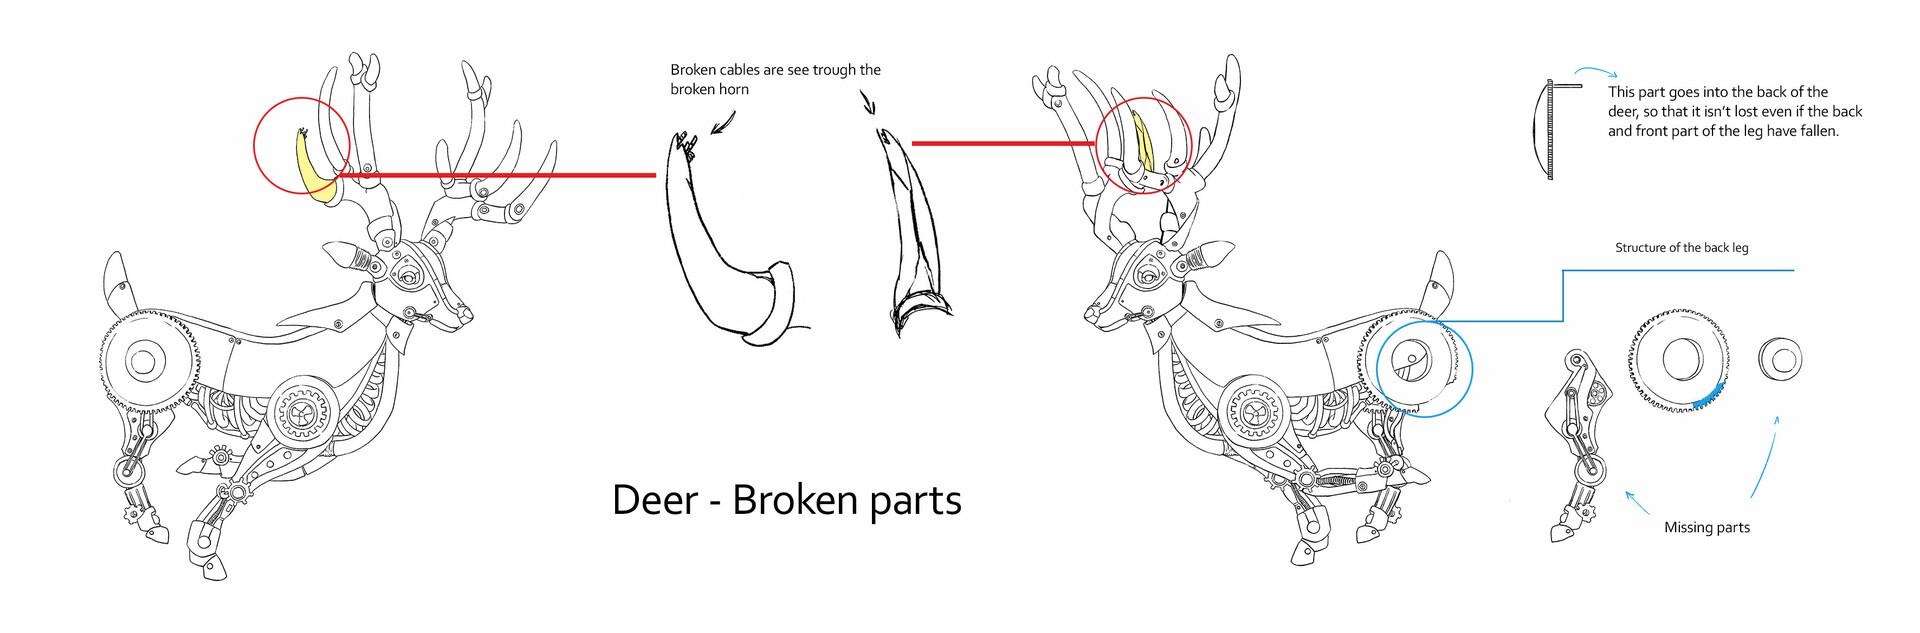 Broken details and explanations